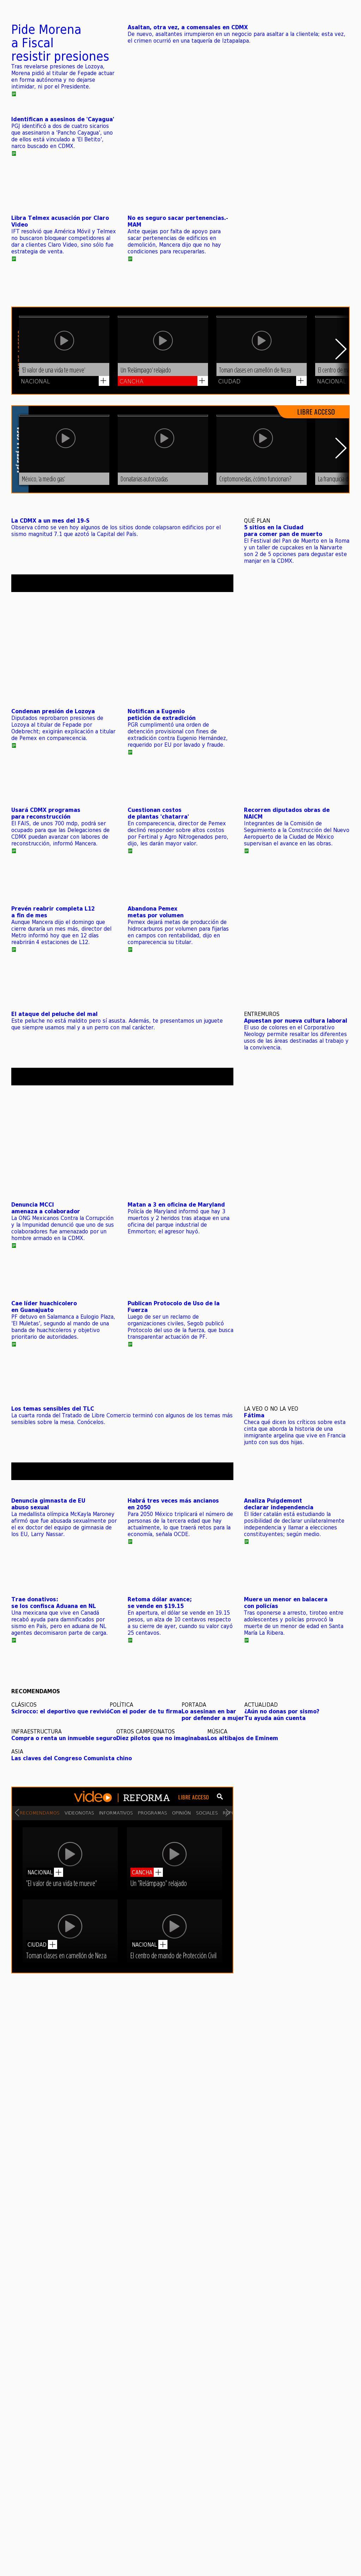 Reforma.com at Wednesday Oct. 18, 2017, 6:17 p.m. UTC